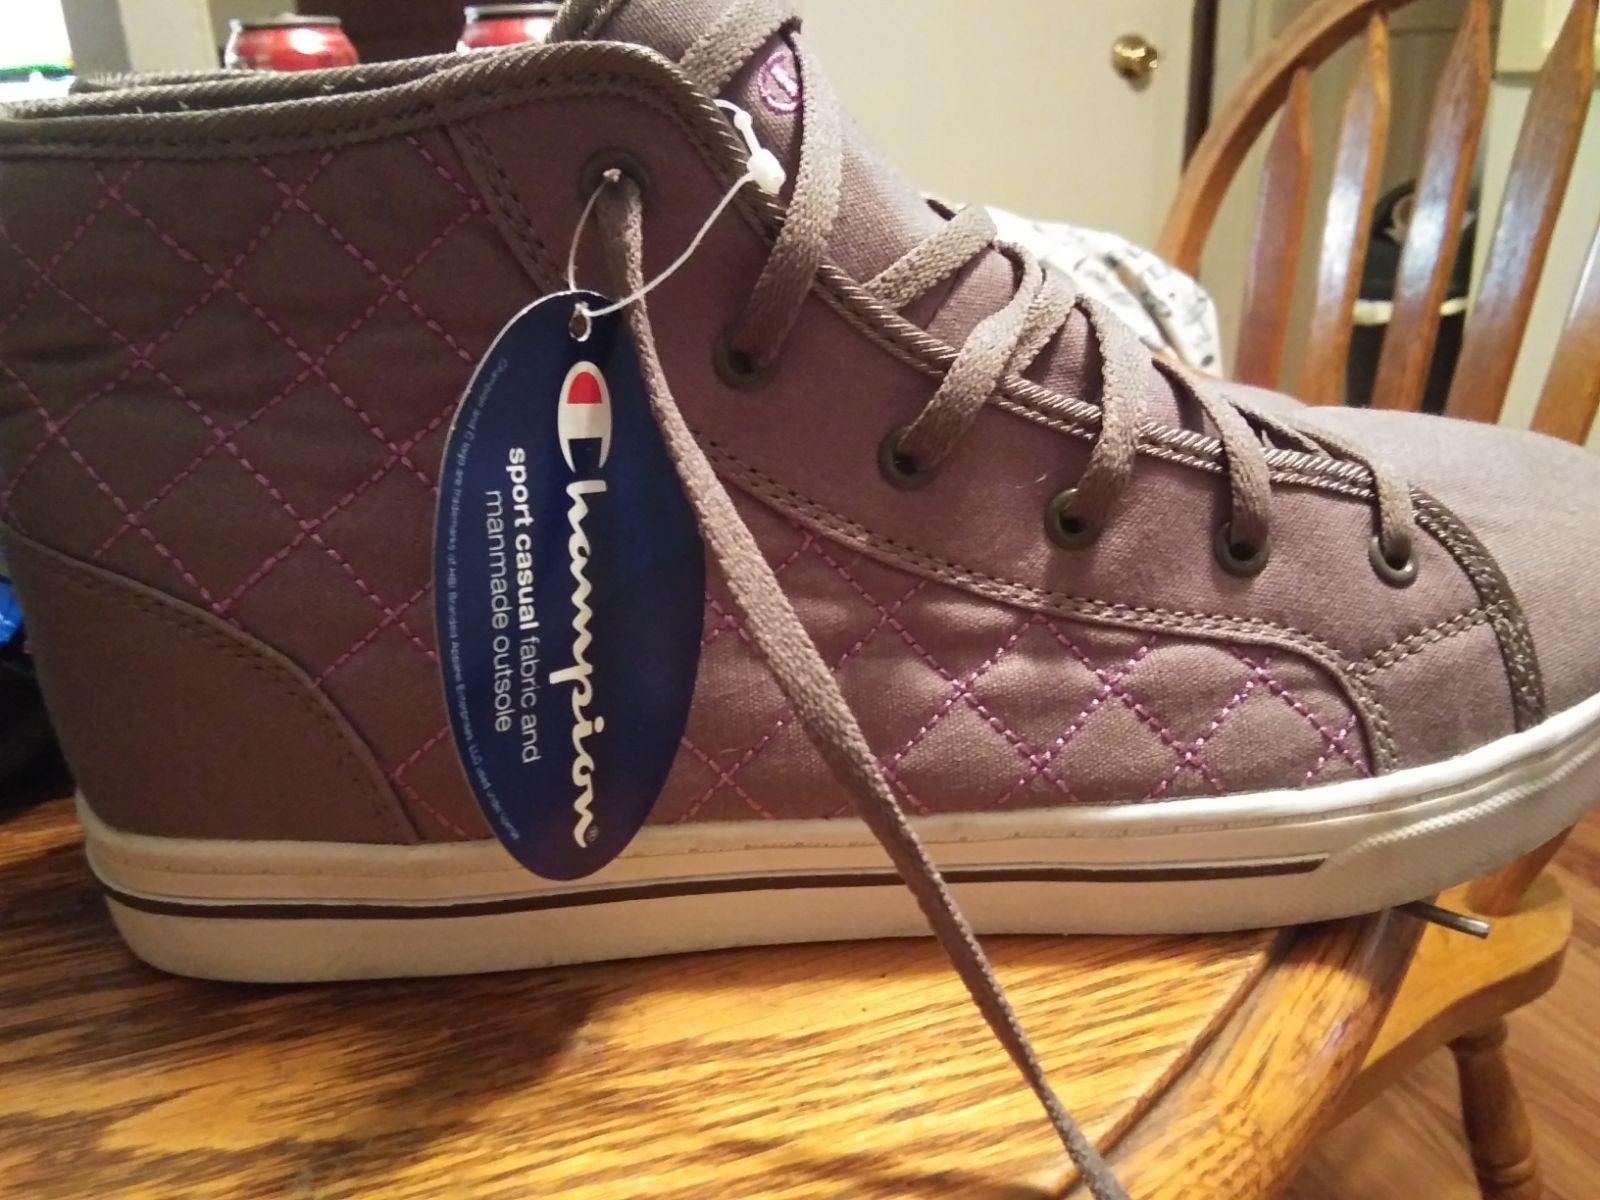 Old school women's CHAMPION sneakers